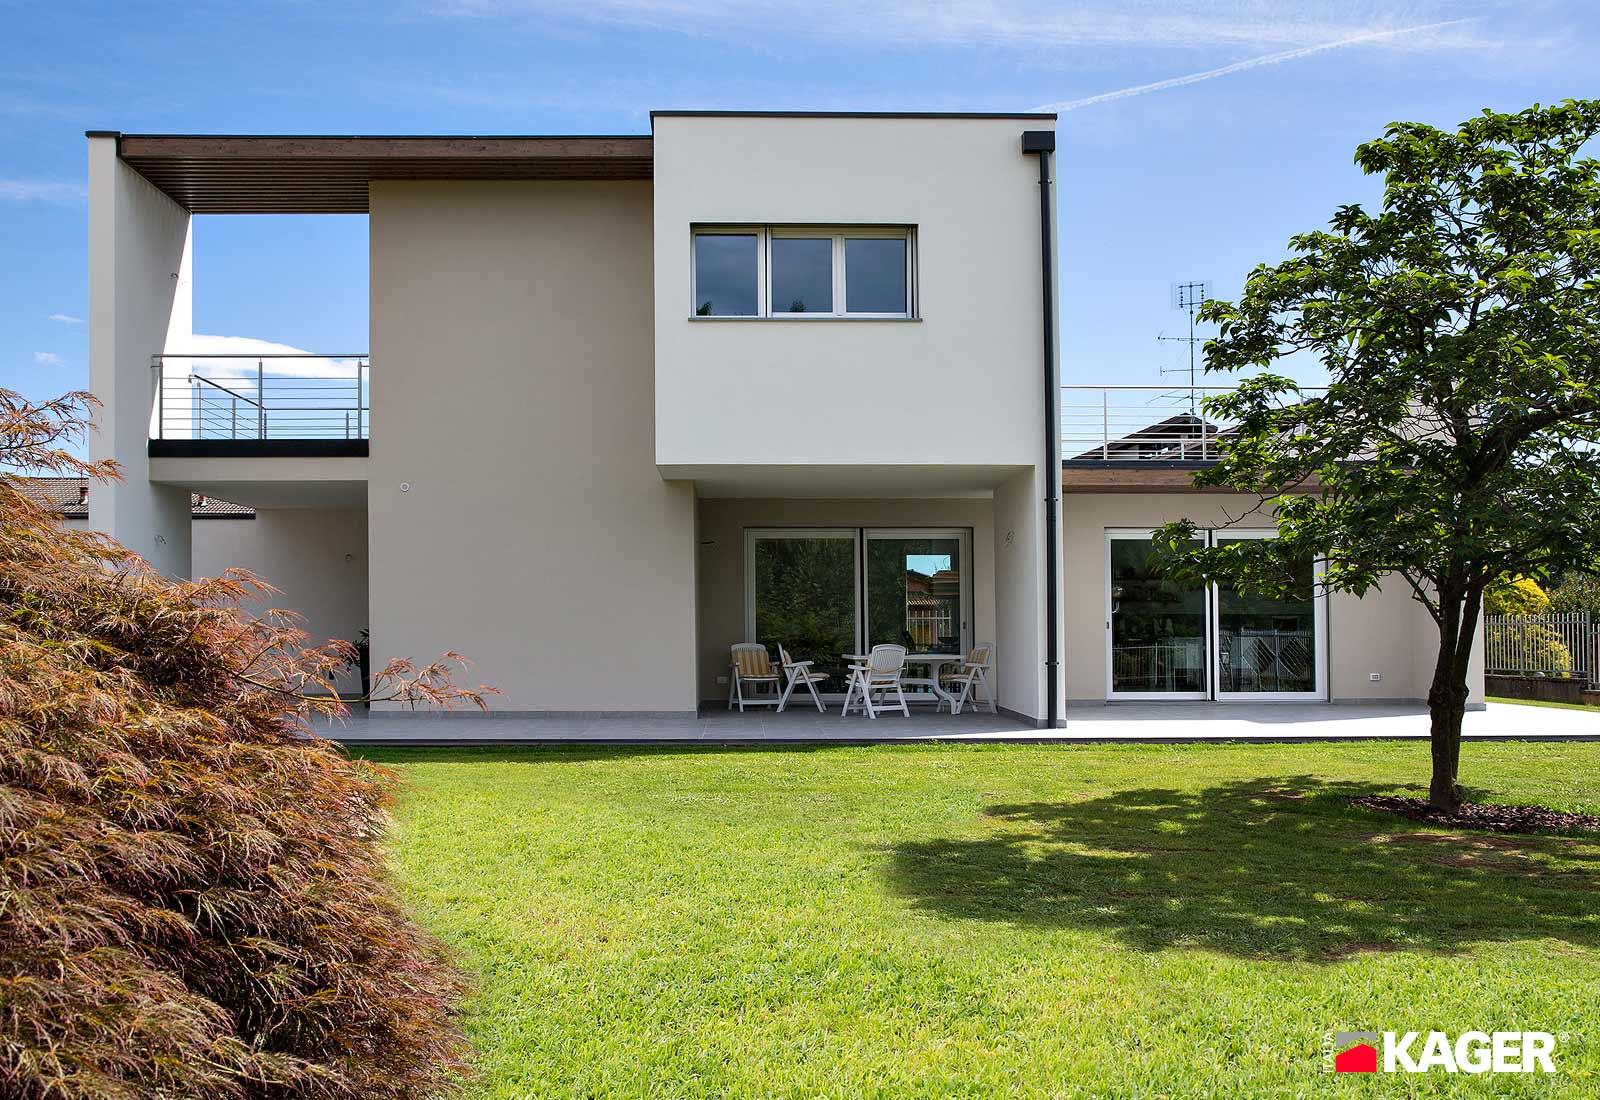 Casa-in-legno-Boca-Novara-Kager-Italia-05